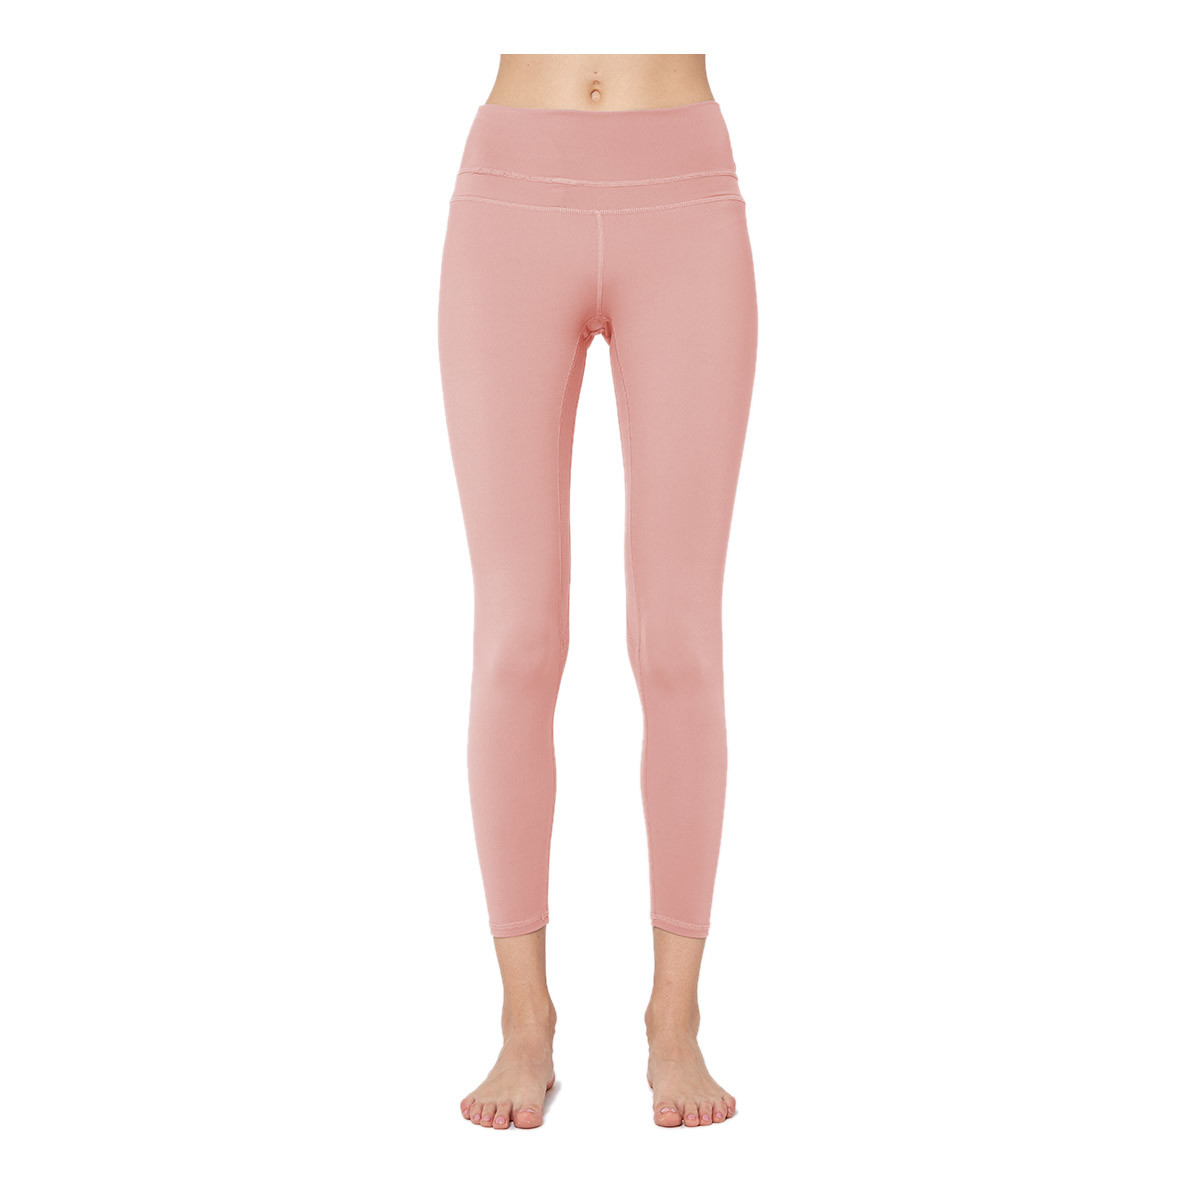 2020 Women's Fashion Yoga Leggings Dance Pants For Wholesale